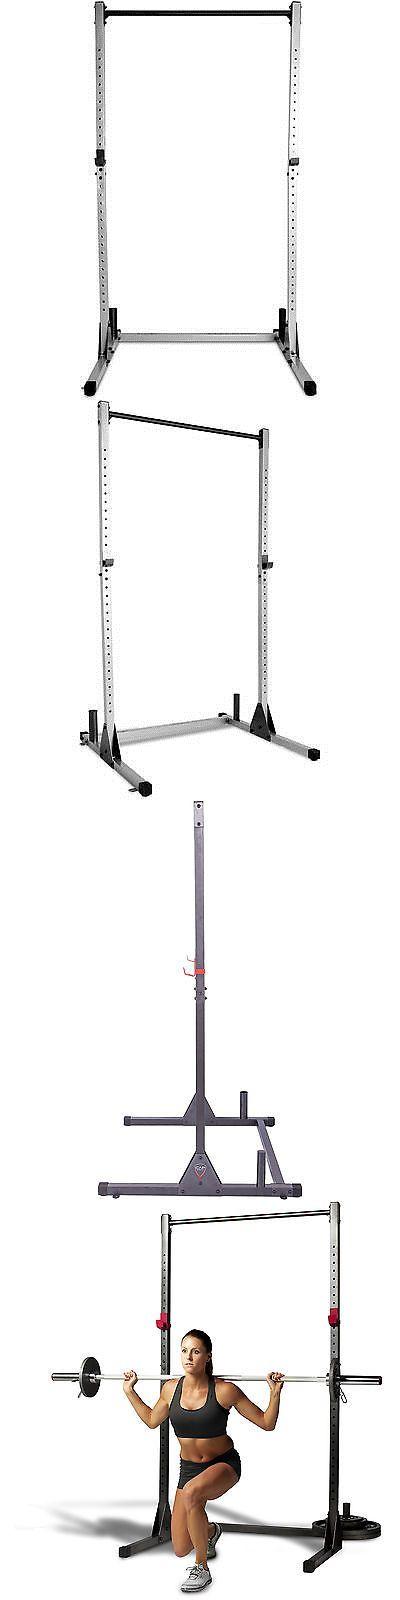 17 Best Ideas About Power Rack On Pinterest Homemade Gym